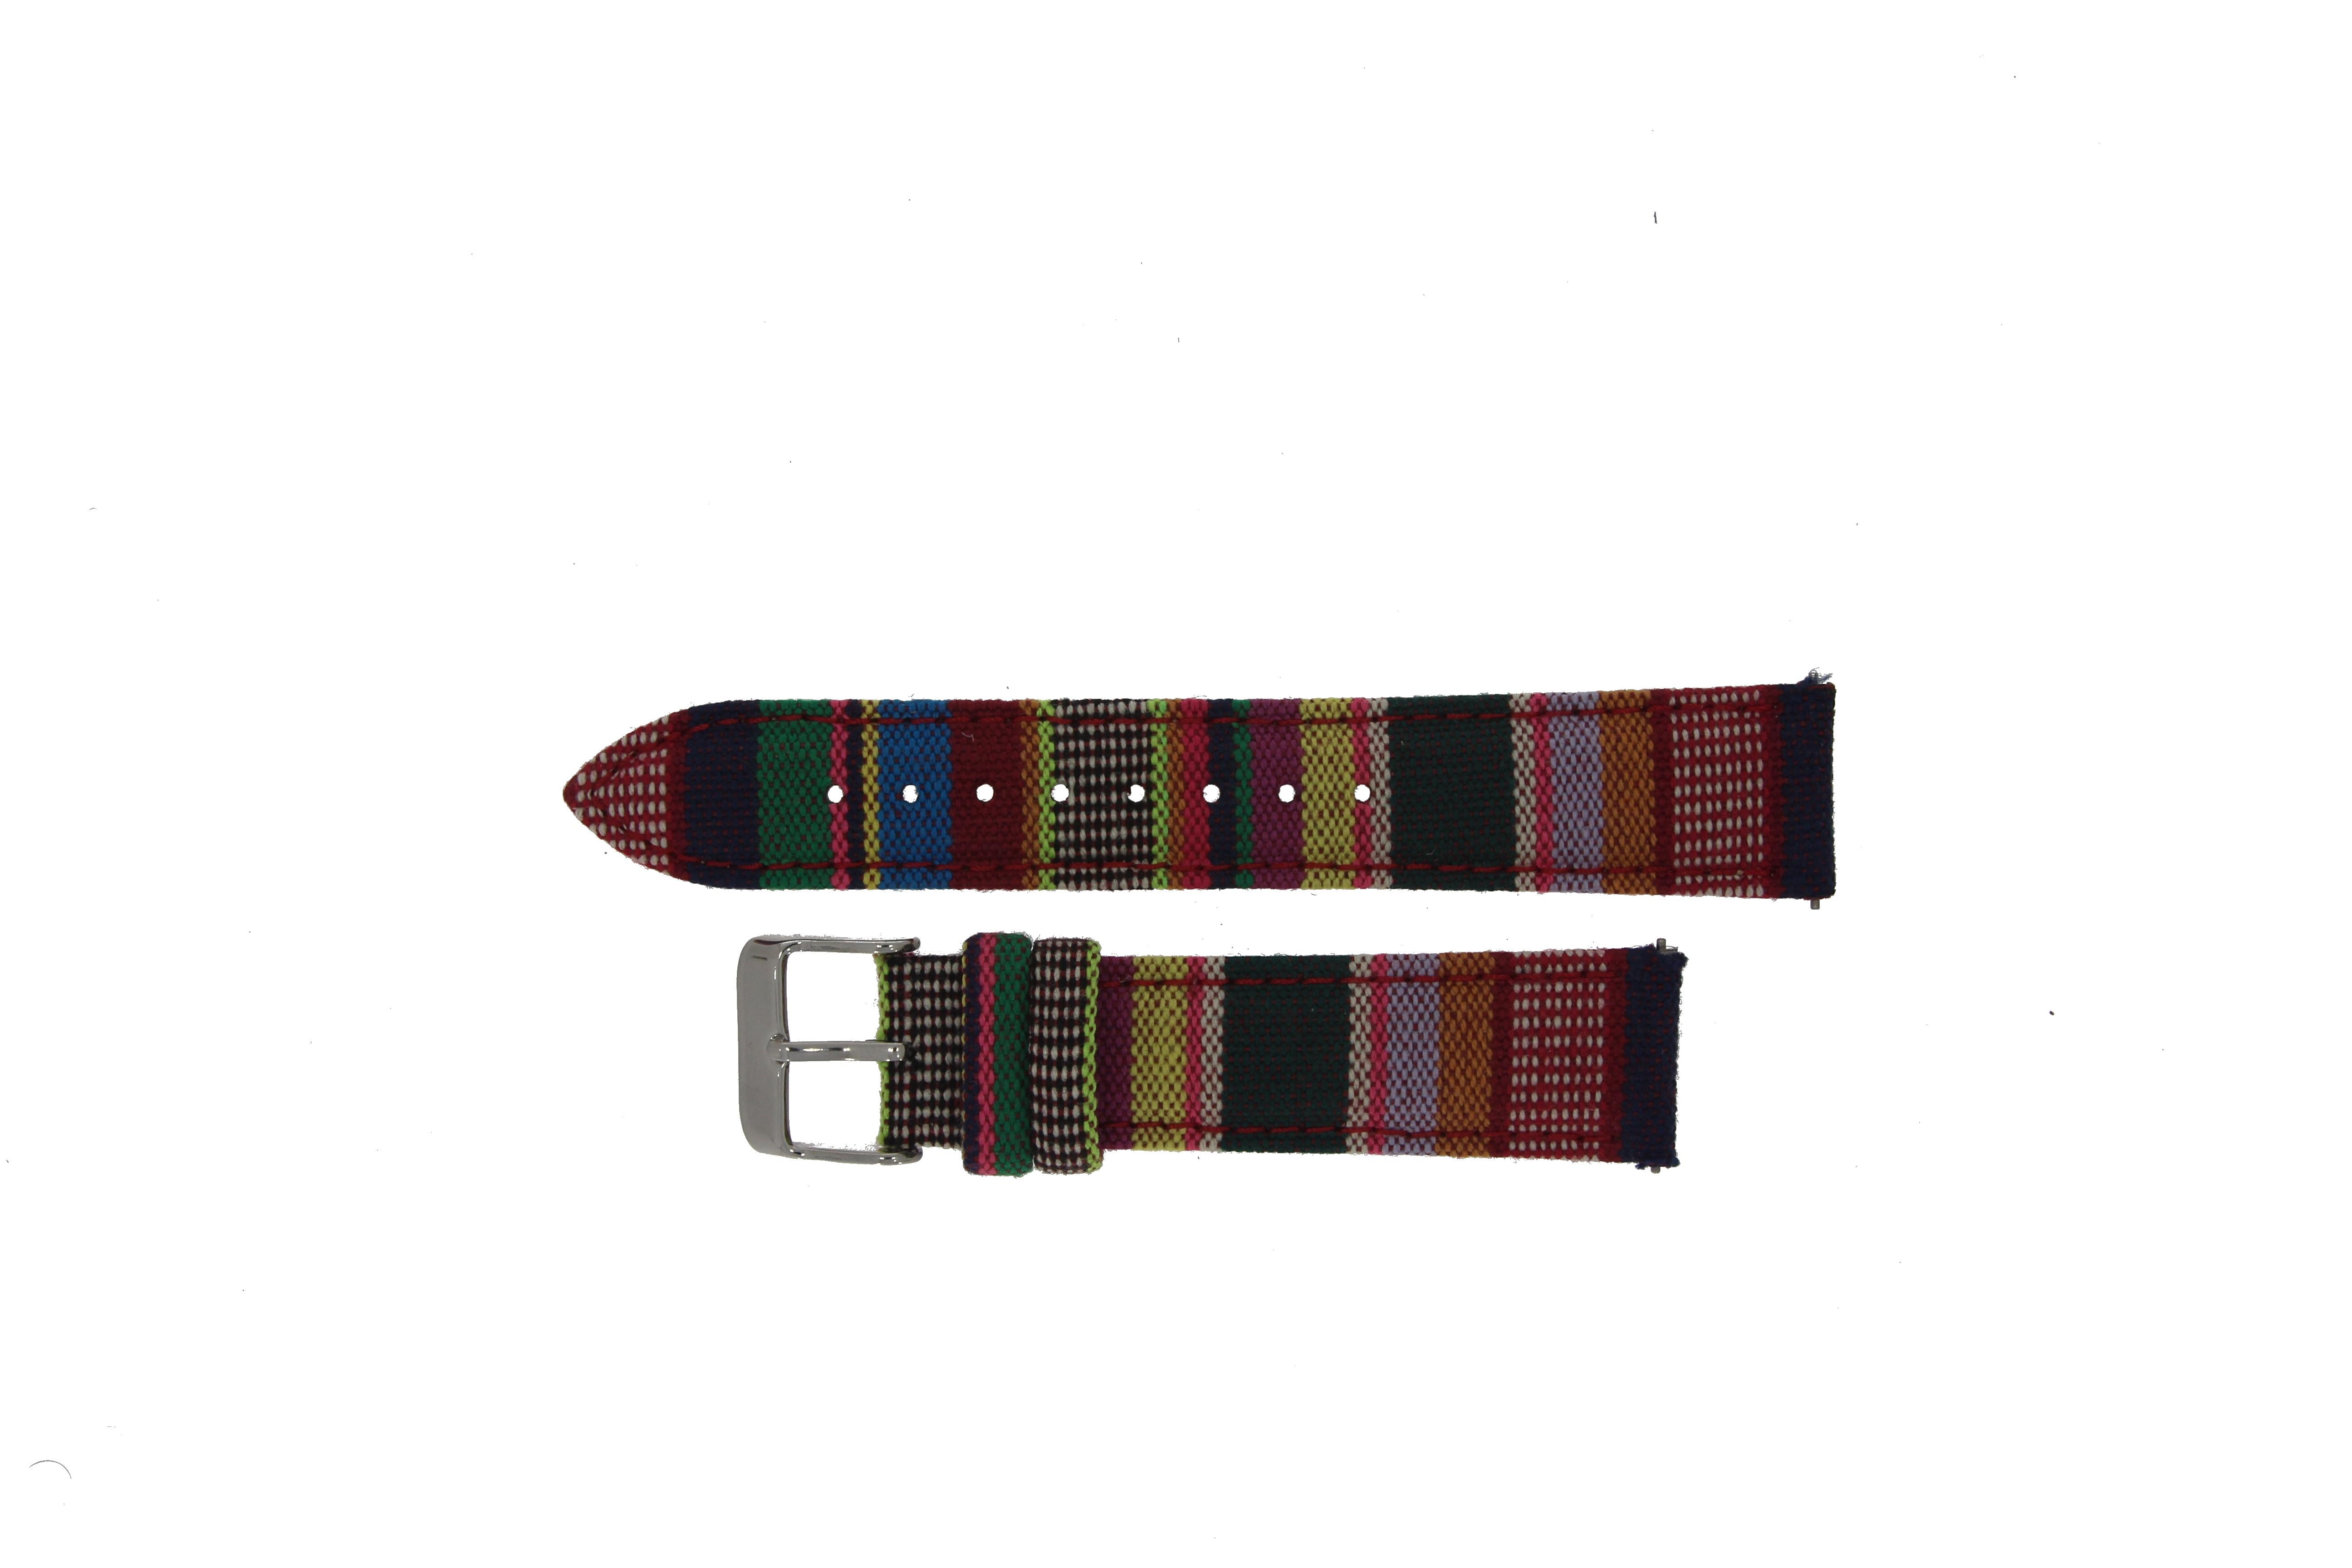 Textil - Leder - Band (20mm) color motif für Samsung Galaxy